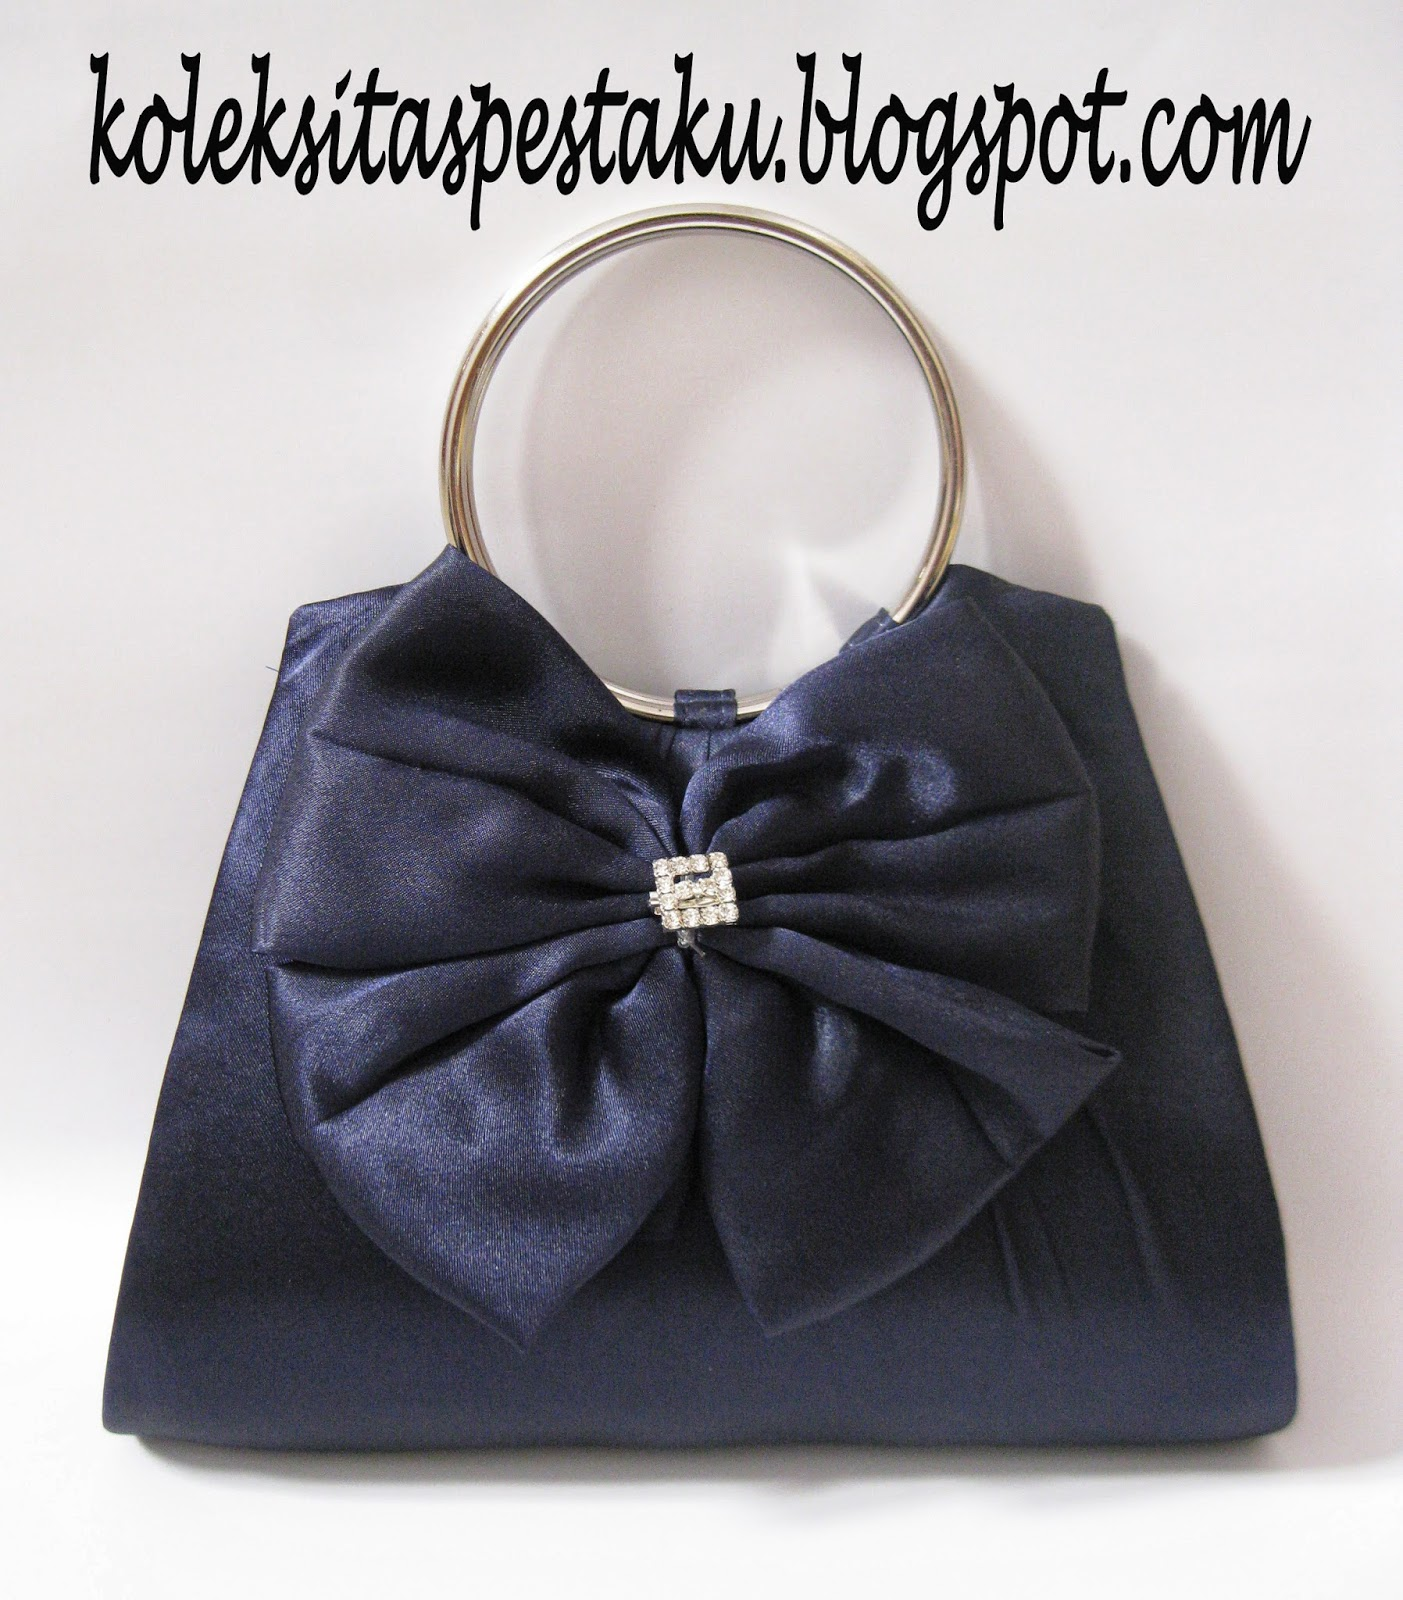 Gold Clutch Bag Simpel Tas Pesta Biru Donker